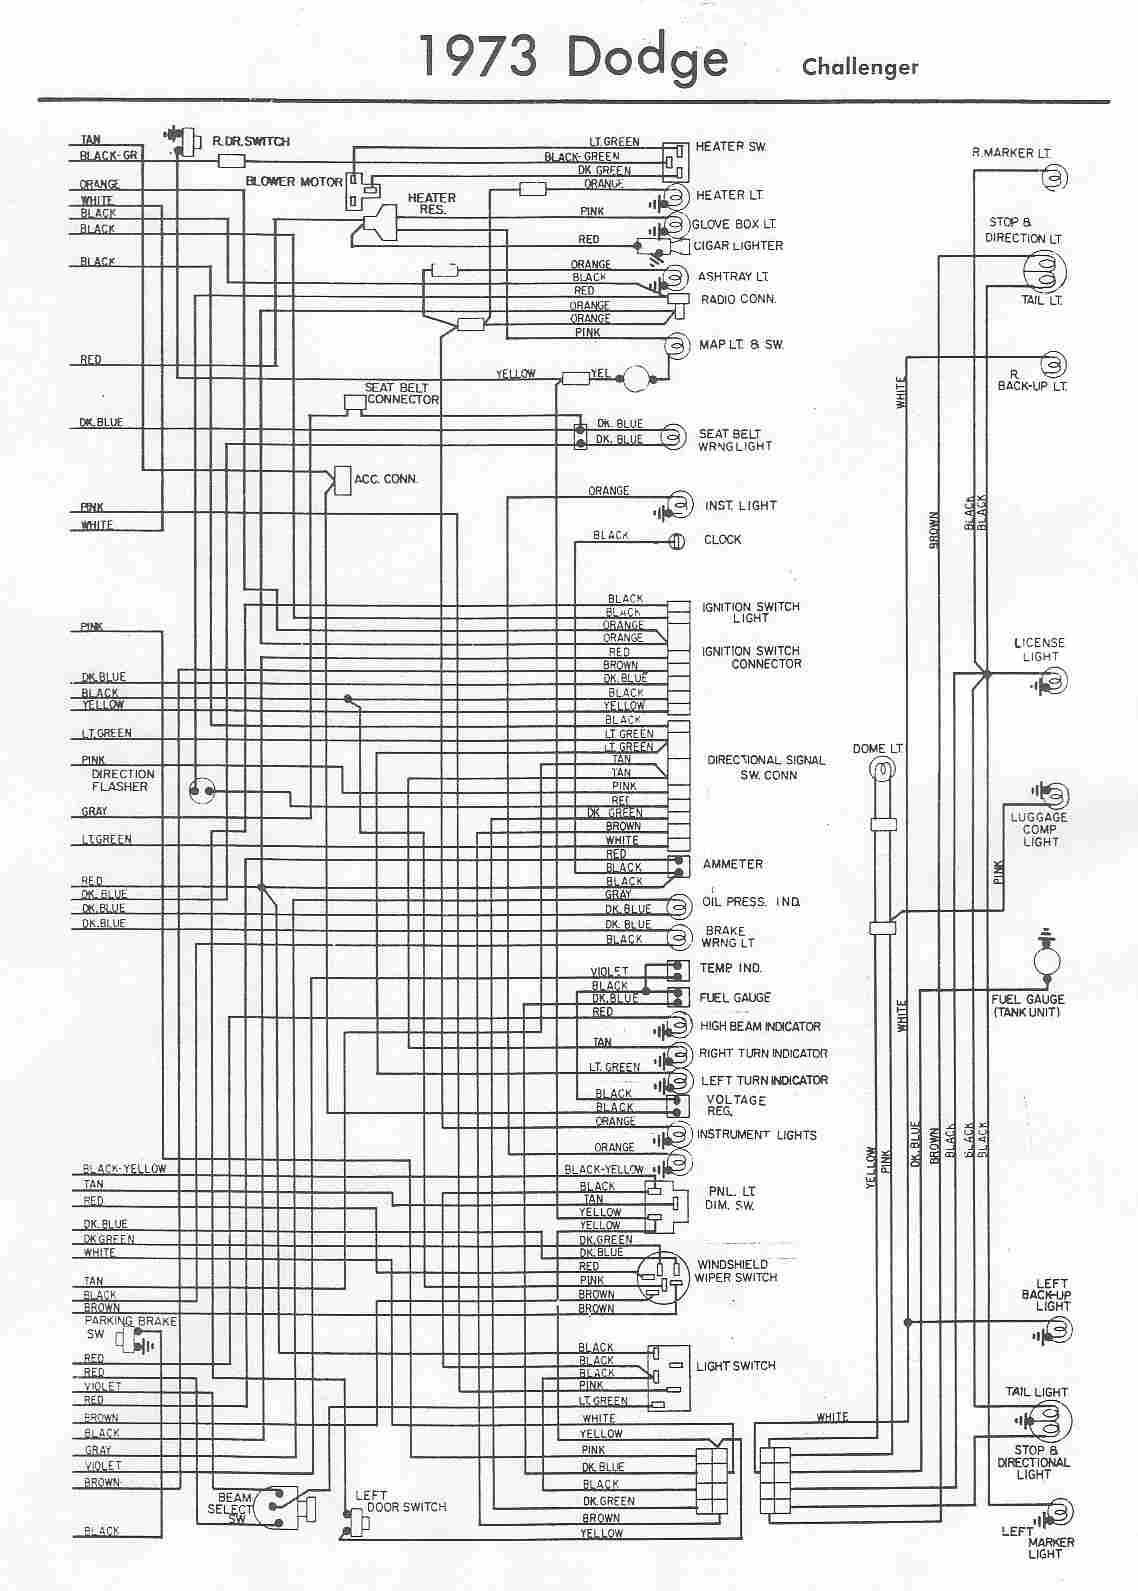 Dodge Van Wiring Diagram For 72 - Data Wiring Diagrams •